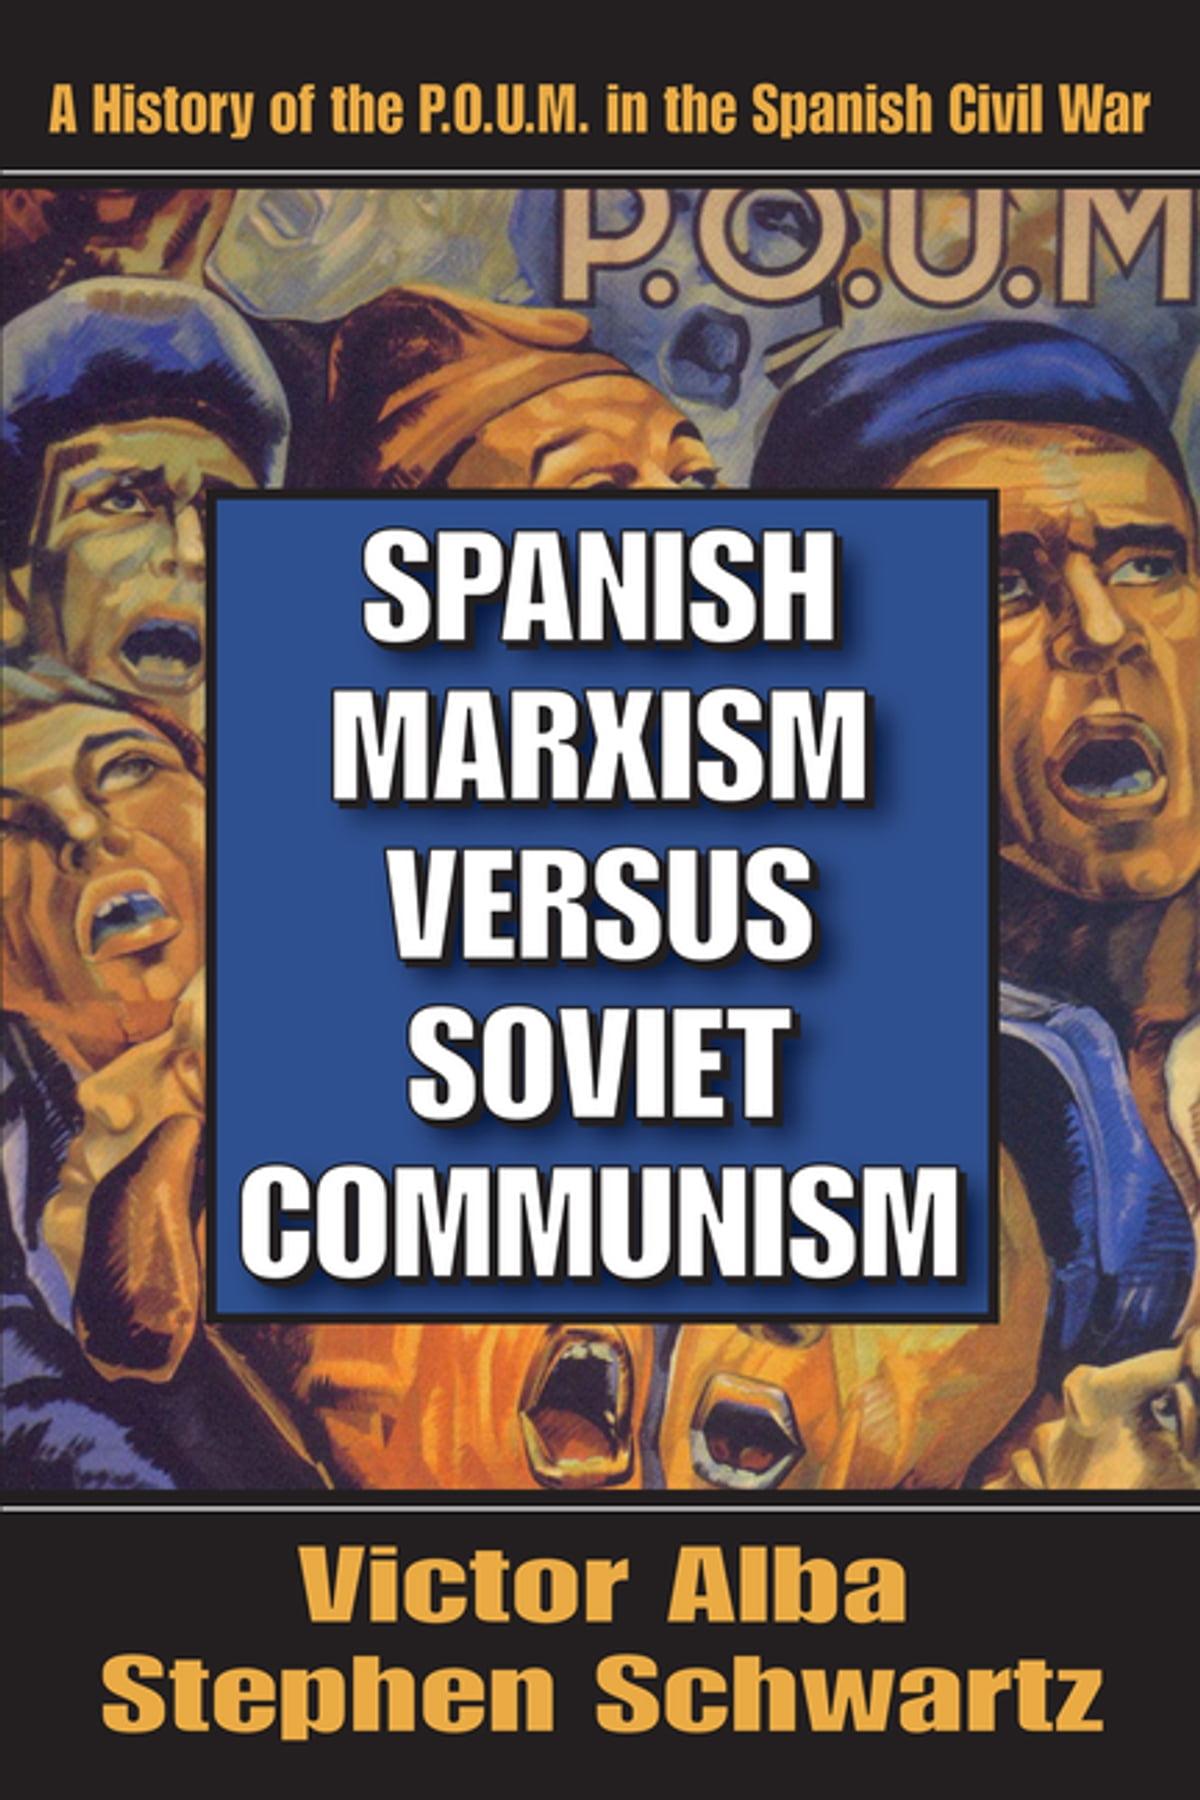 communism vs marxism - 736×1111